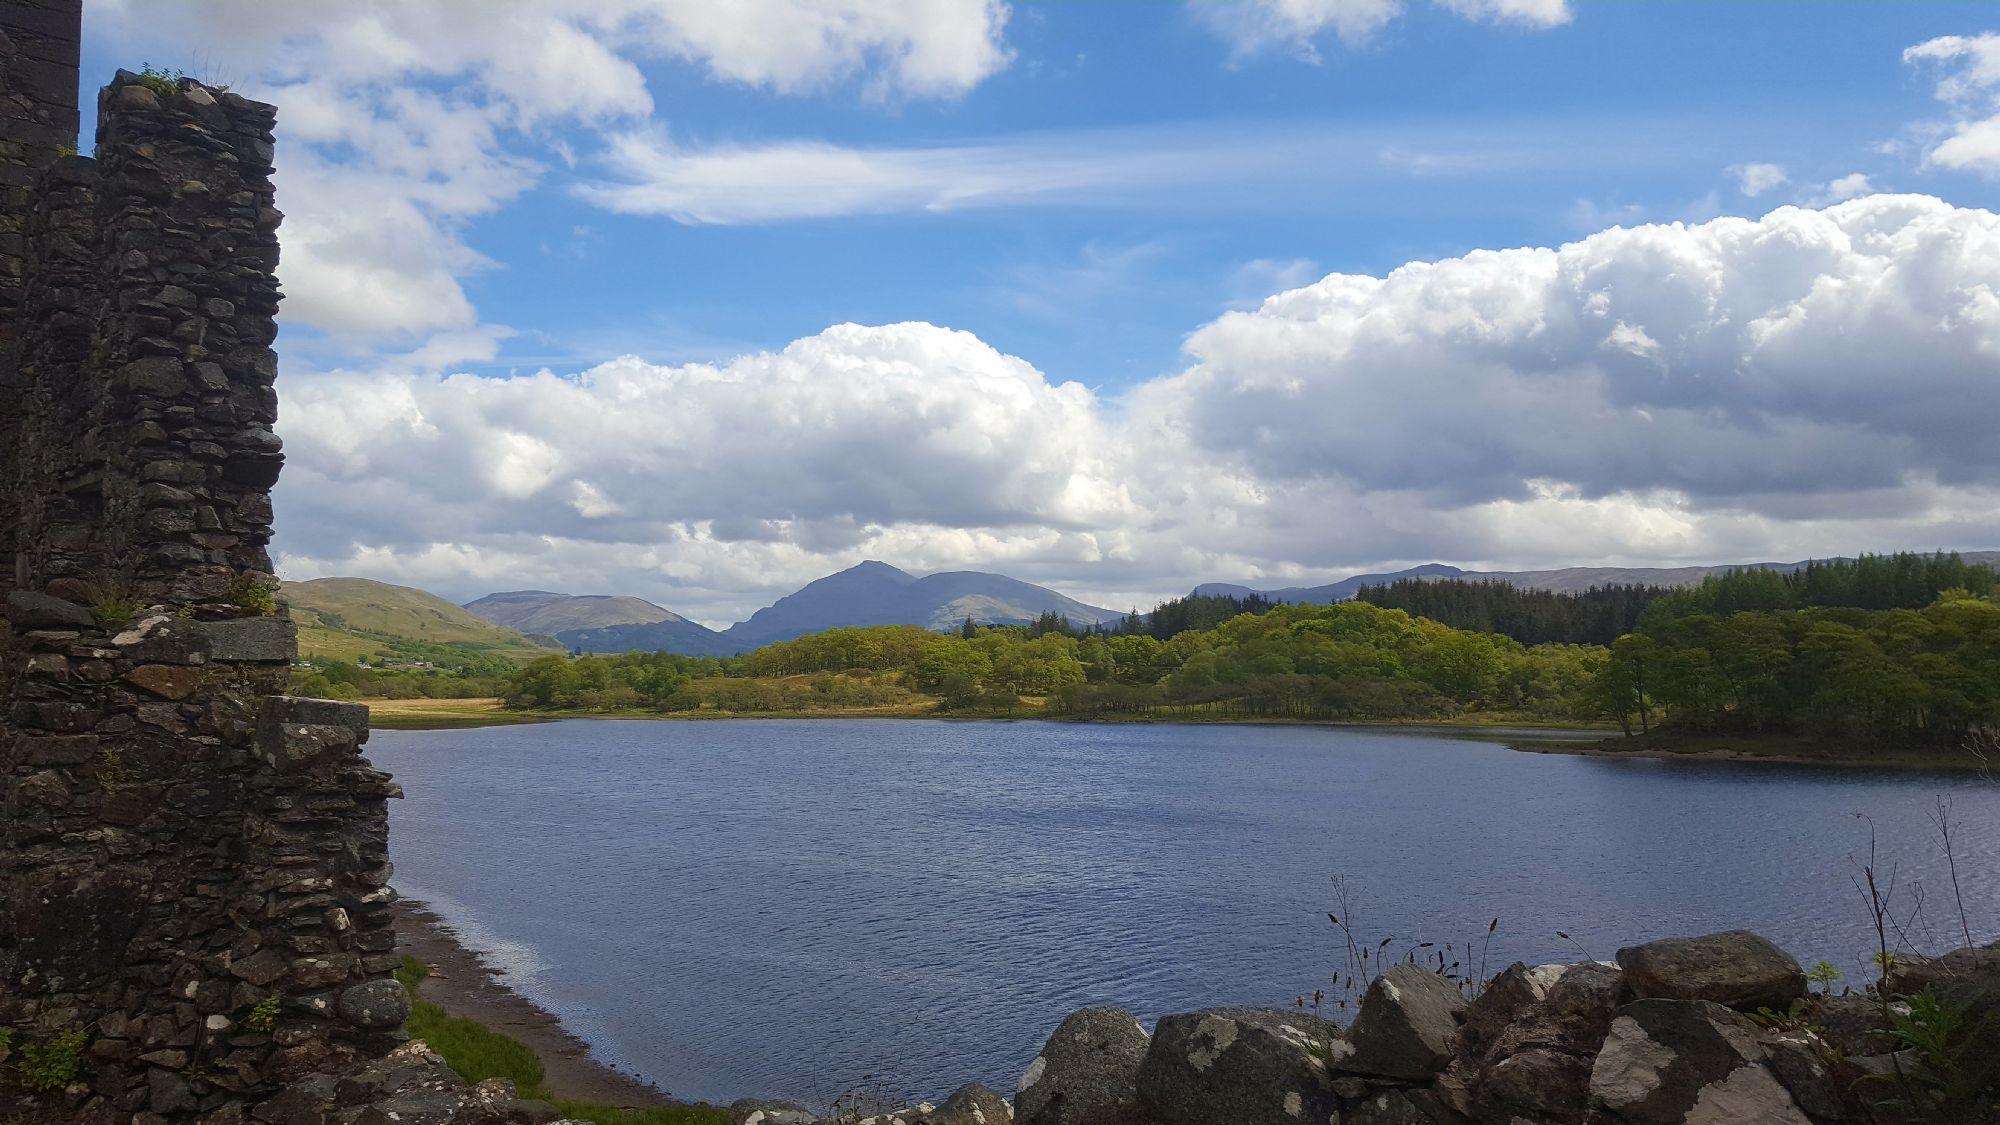 Views over Loch Awe